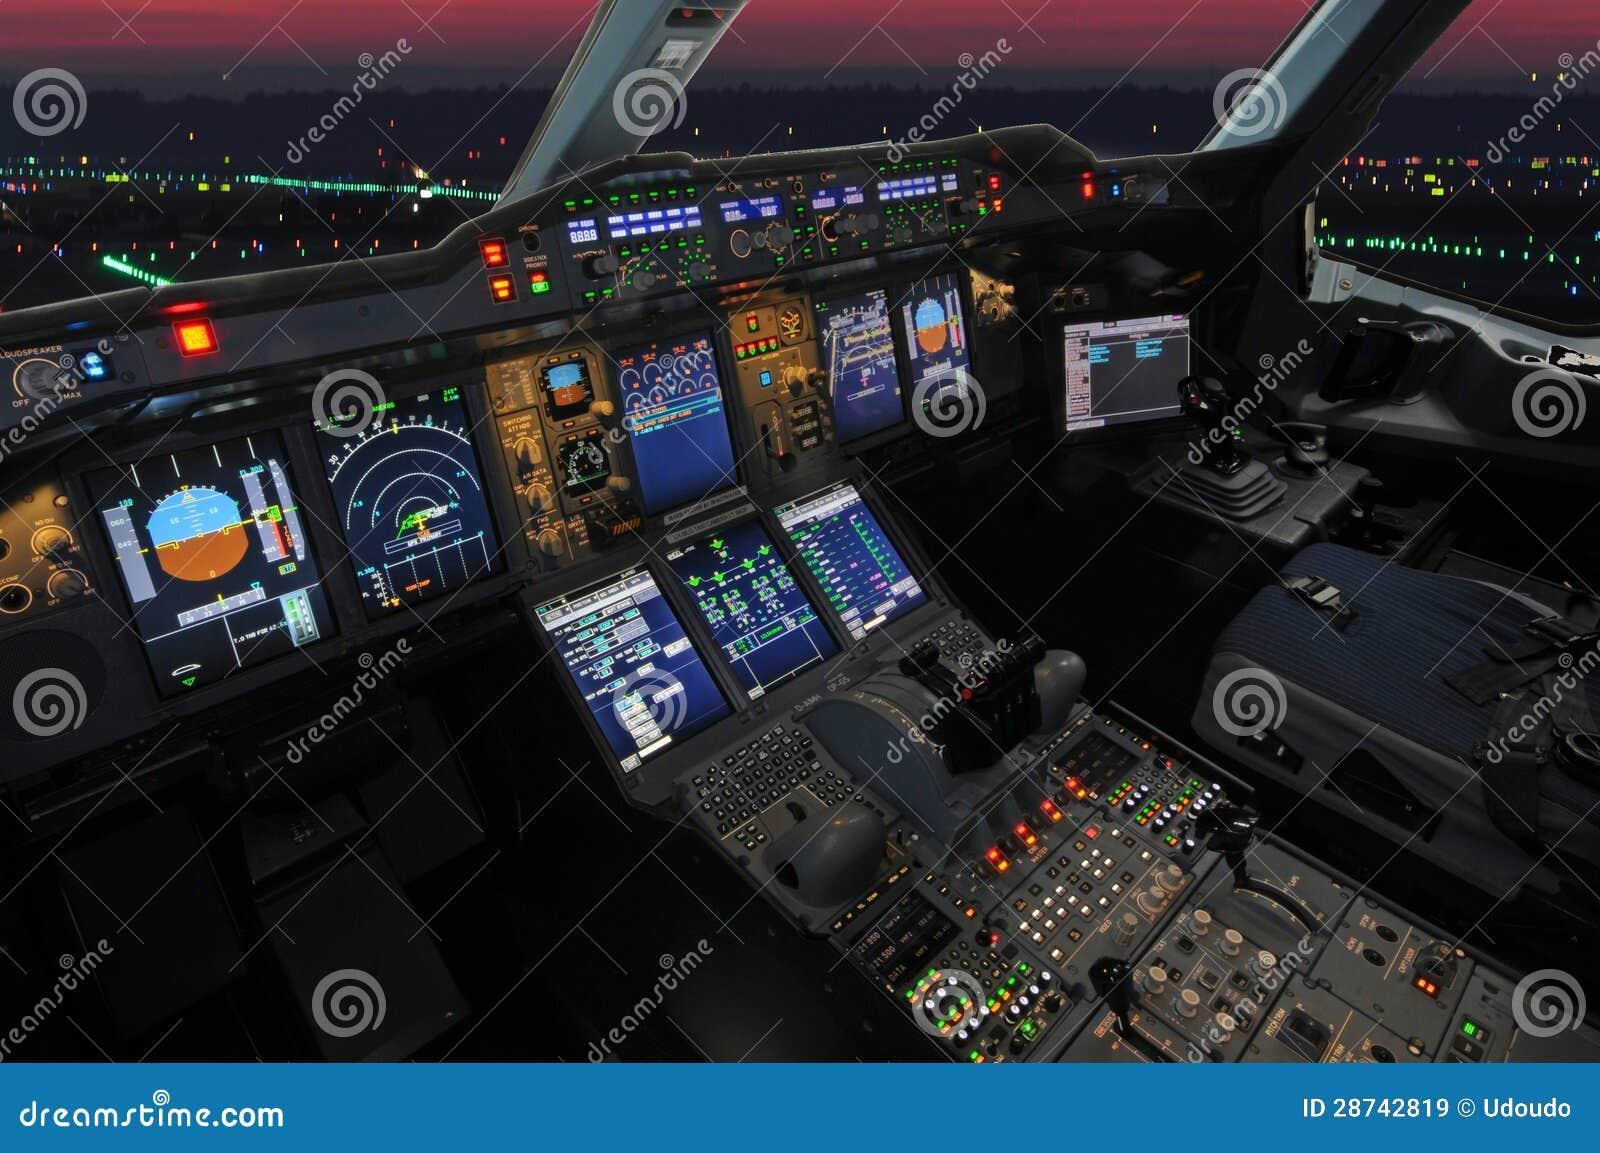 Airbus Cockpit Panel Screen